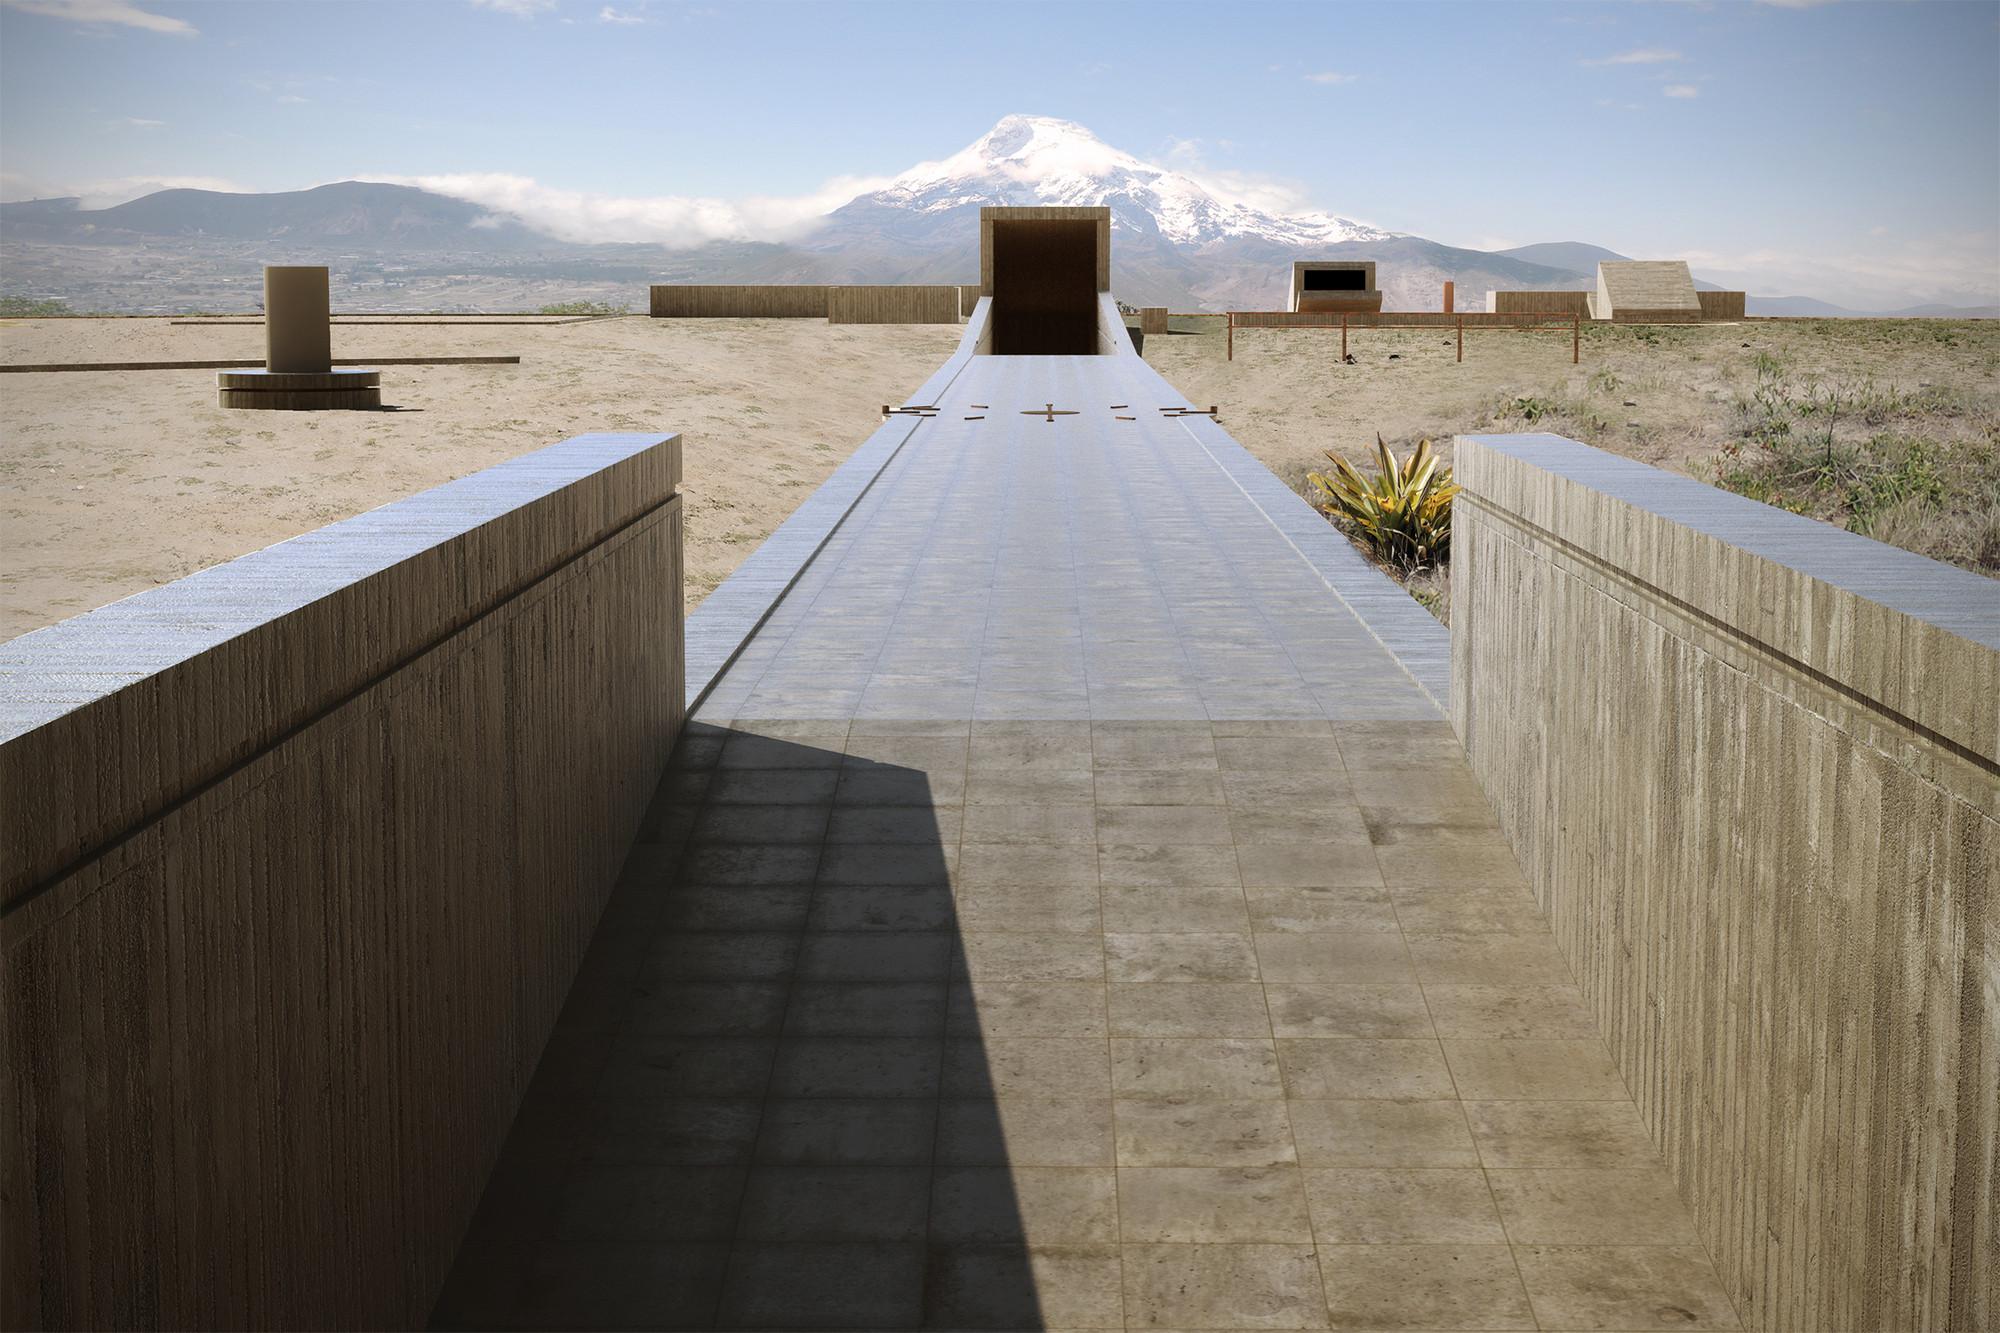 Arq. Betsy Peñaherrera. Image Courtesy of Diagonal Arquitectura